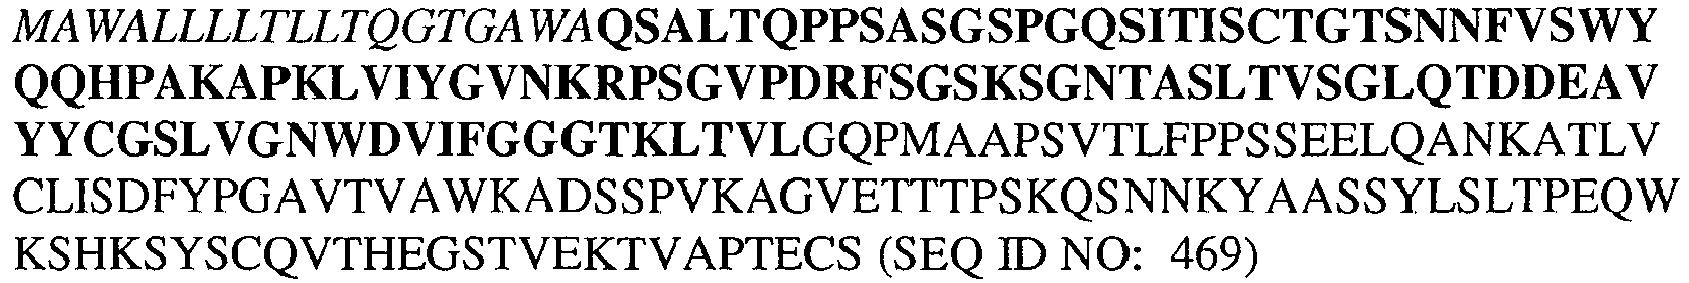 Figure imgb0352